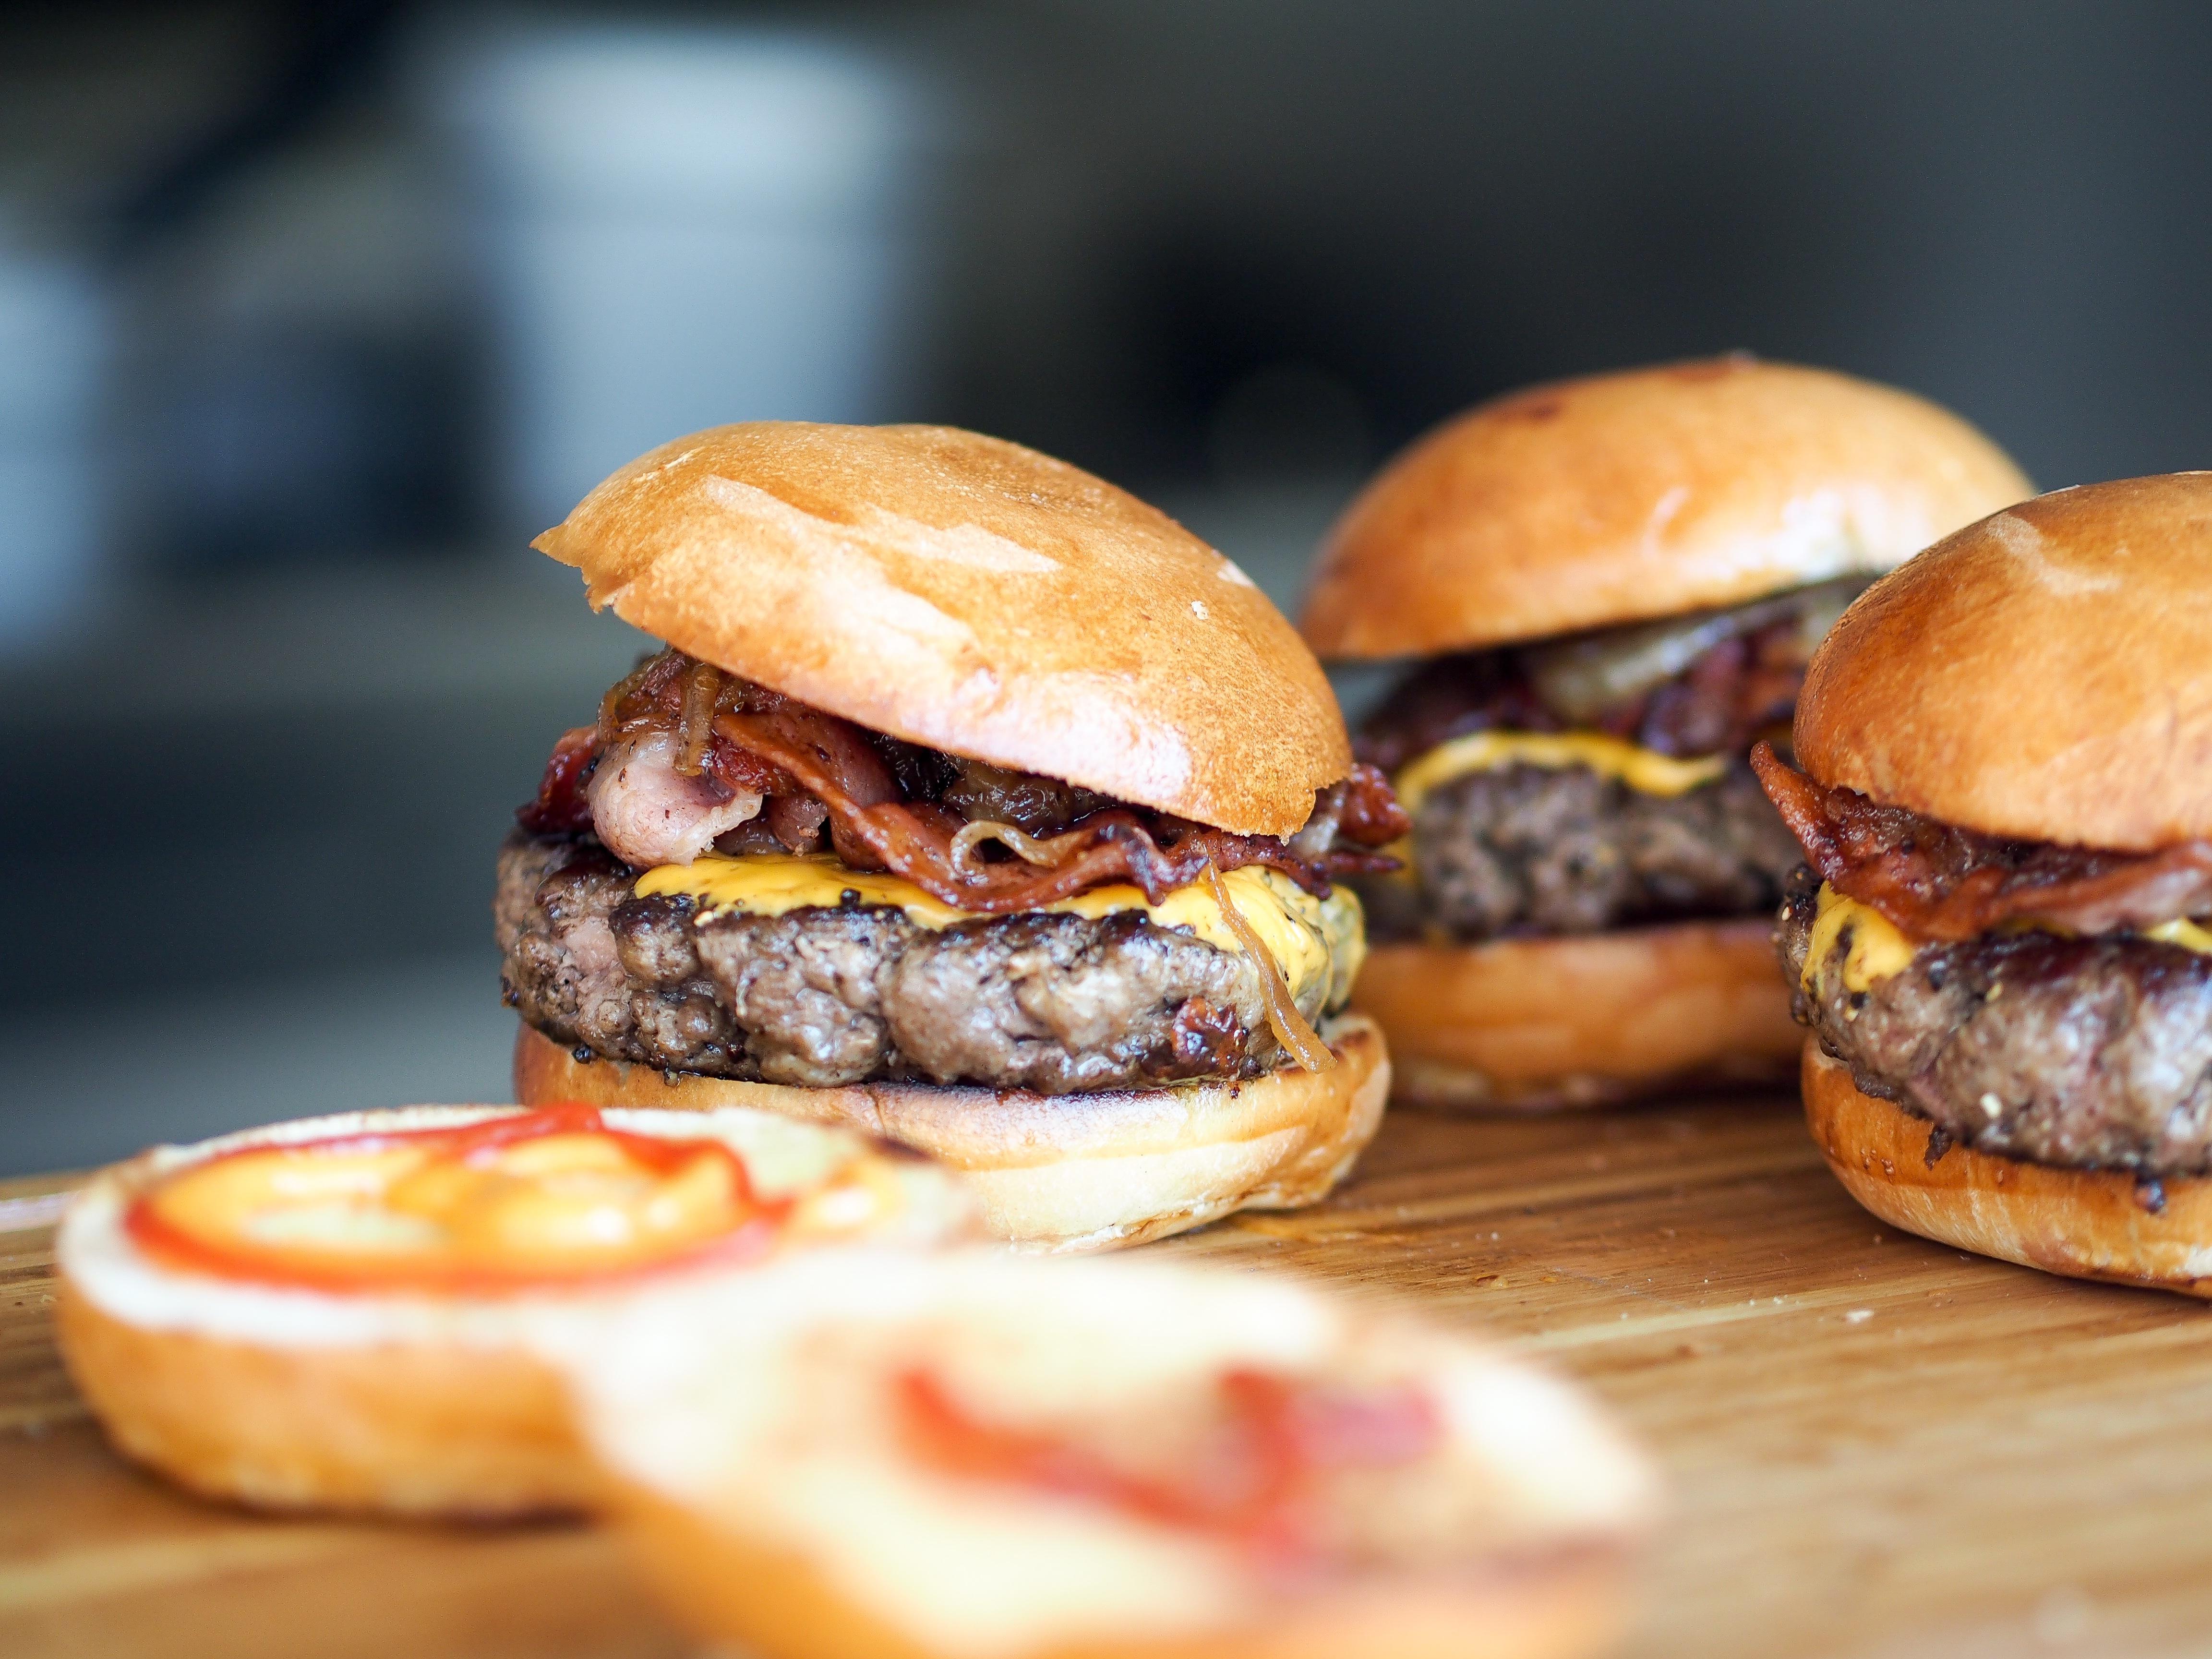 Burger health 2017 trends